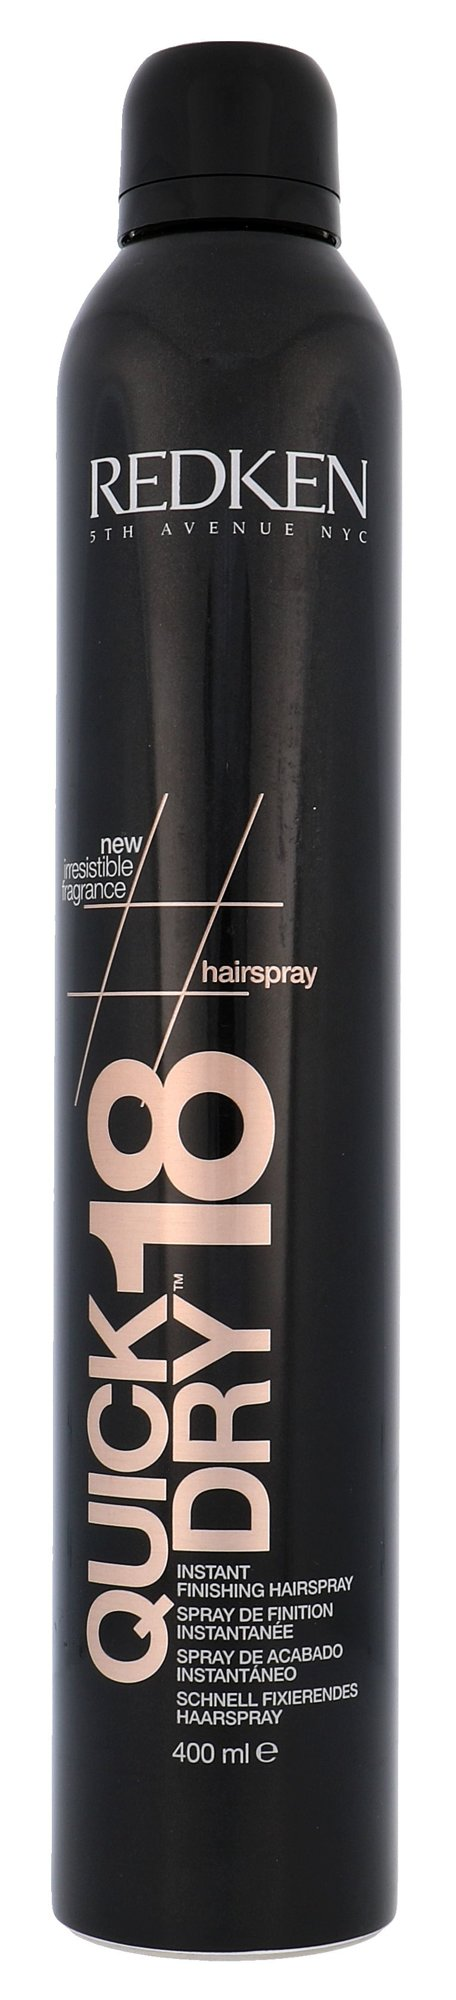 Redken Quick Dry 18 Cosmetic 400ml